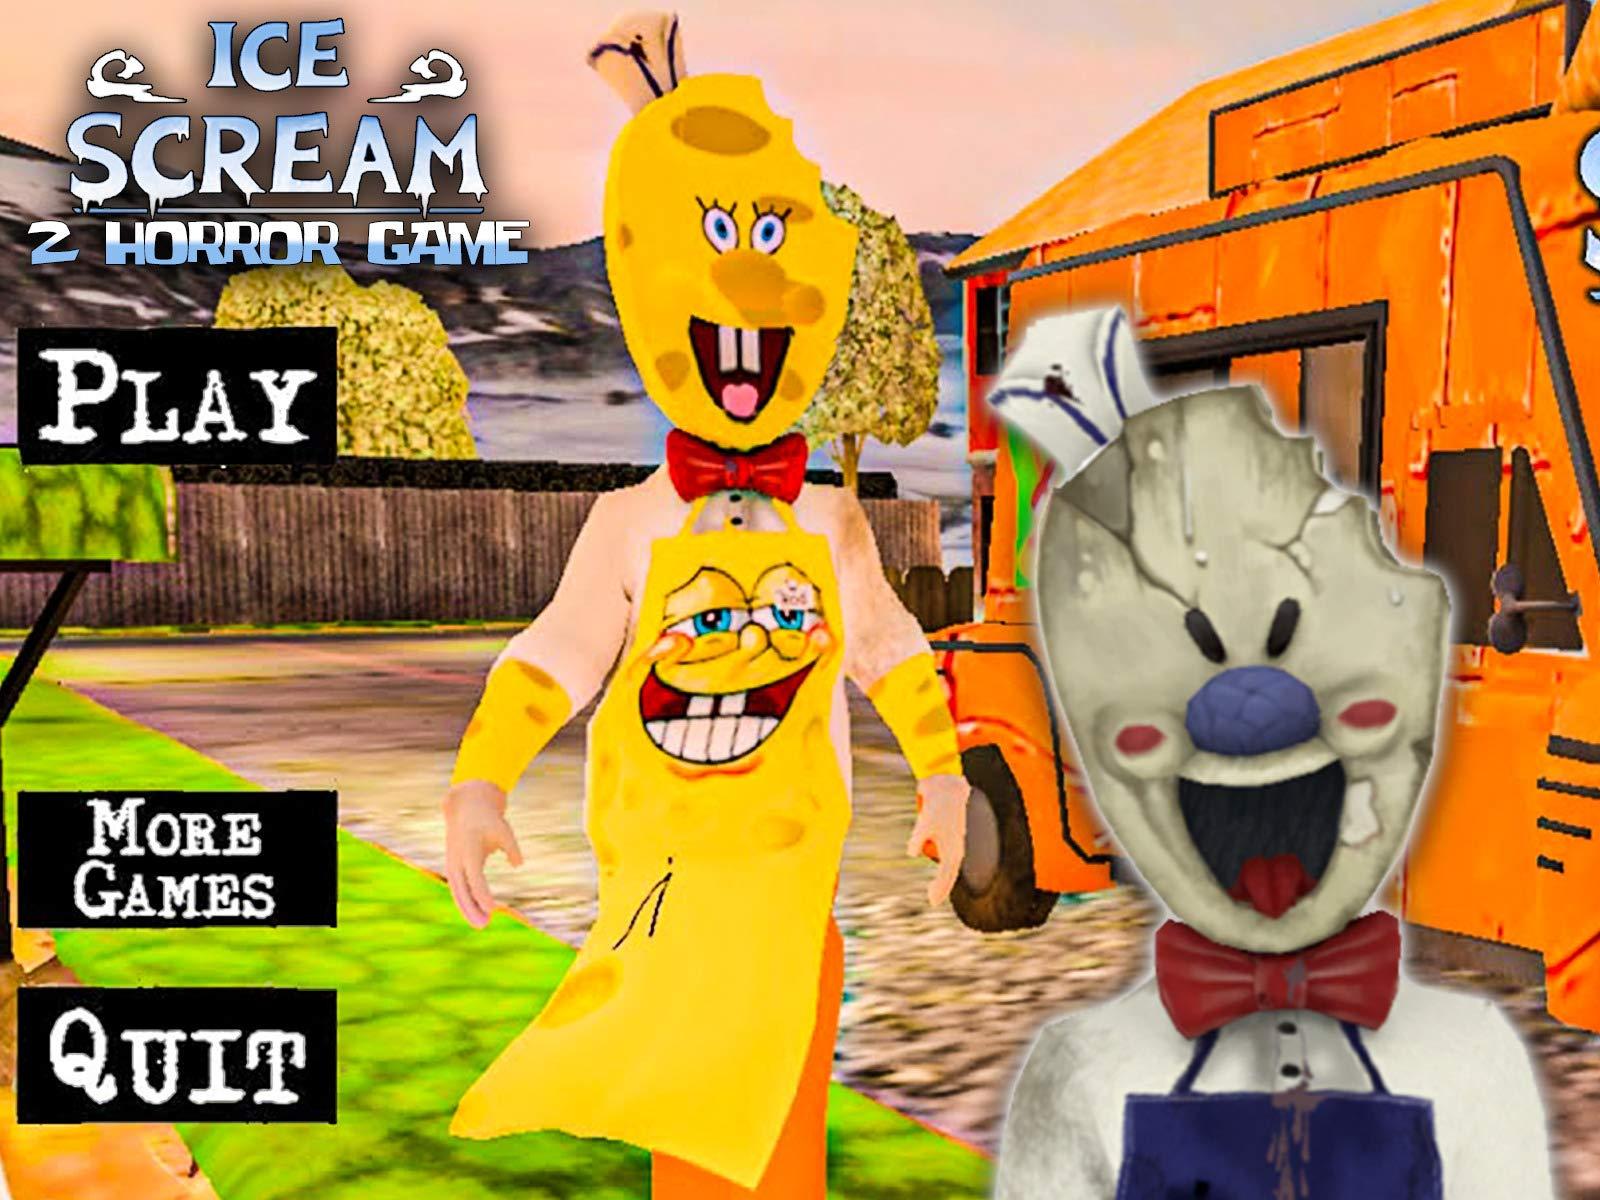 Ice Scar Roblox Watch Clip Ice Scream 2 Horror Game Prime Video